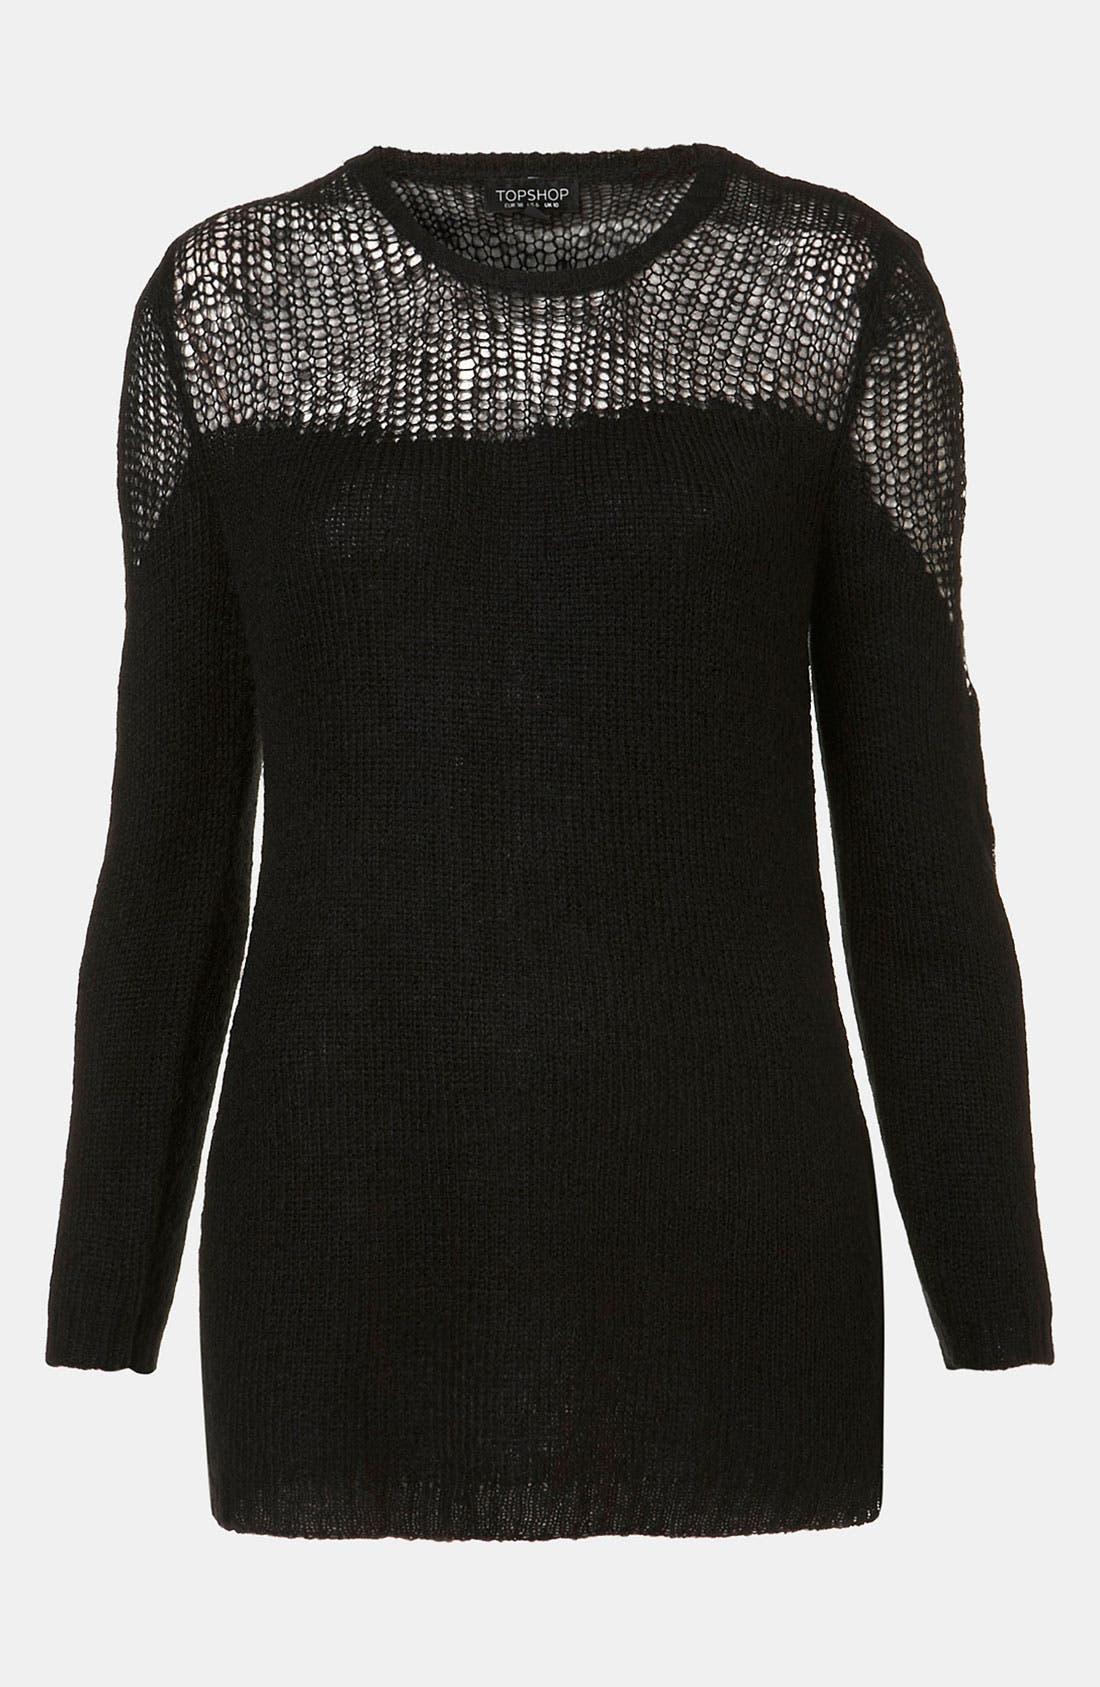 Alternate Image 1 Selected - Topshop Sheer Yoke Sweater